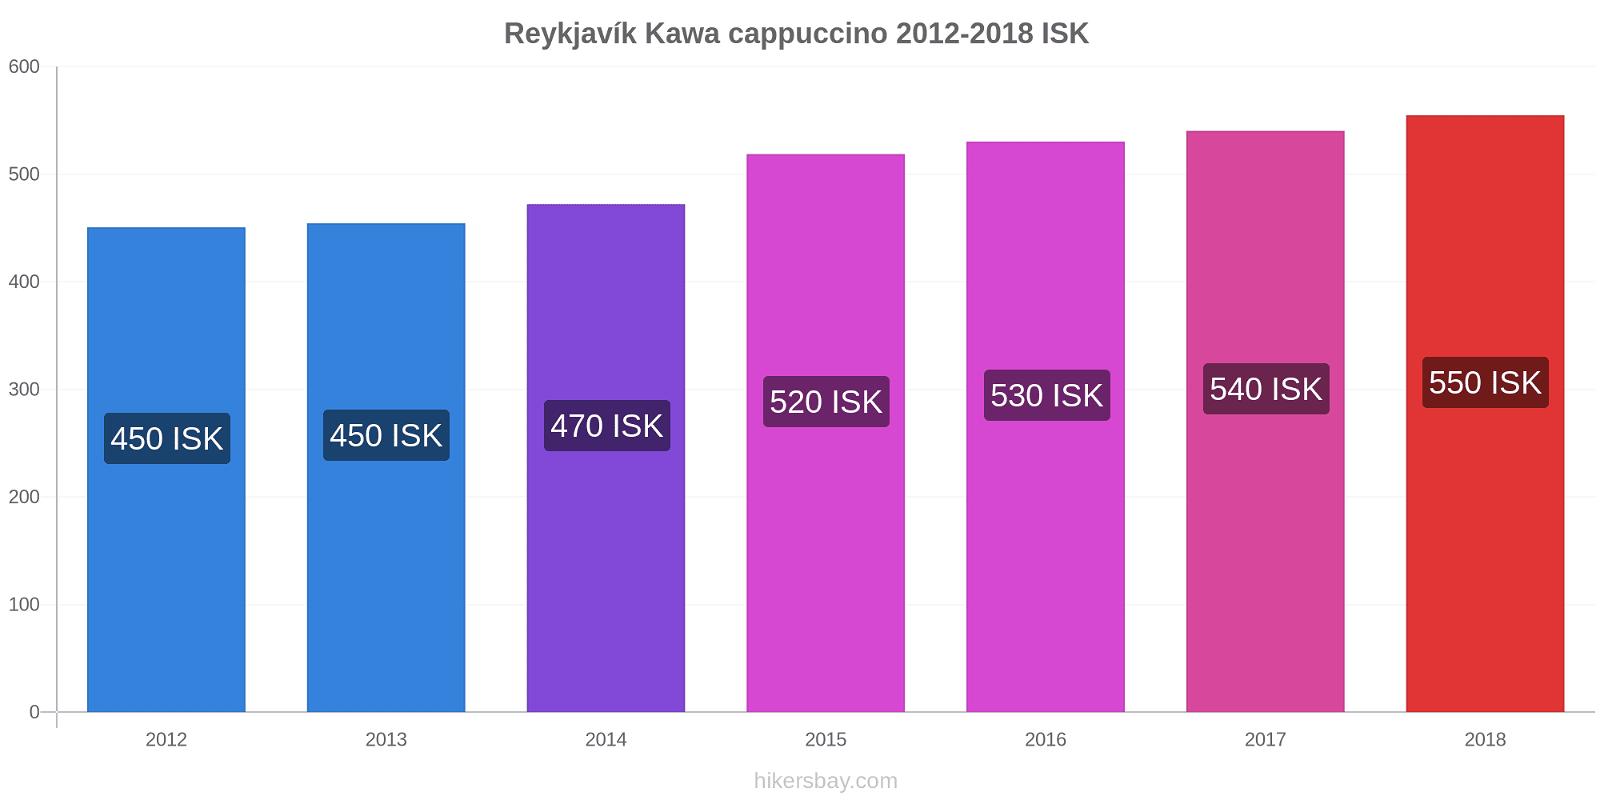 Reykjavík zmiany cen Kawa cappuccino hikersbay.com